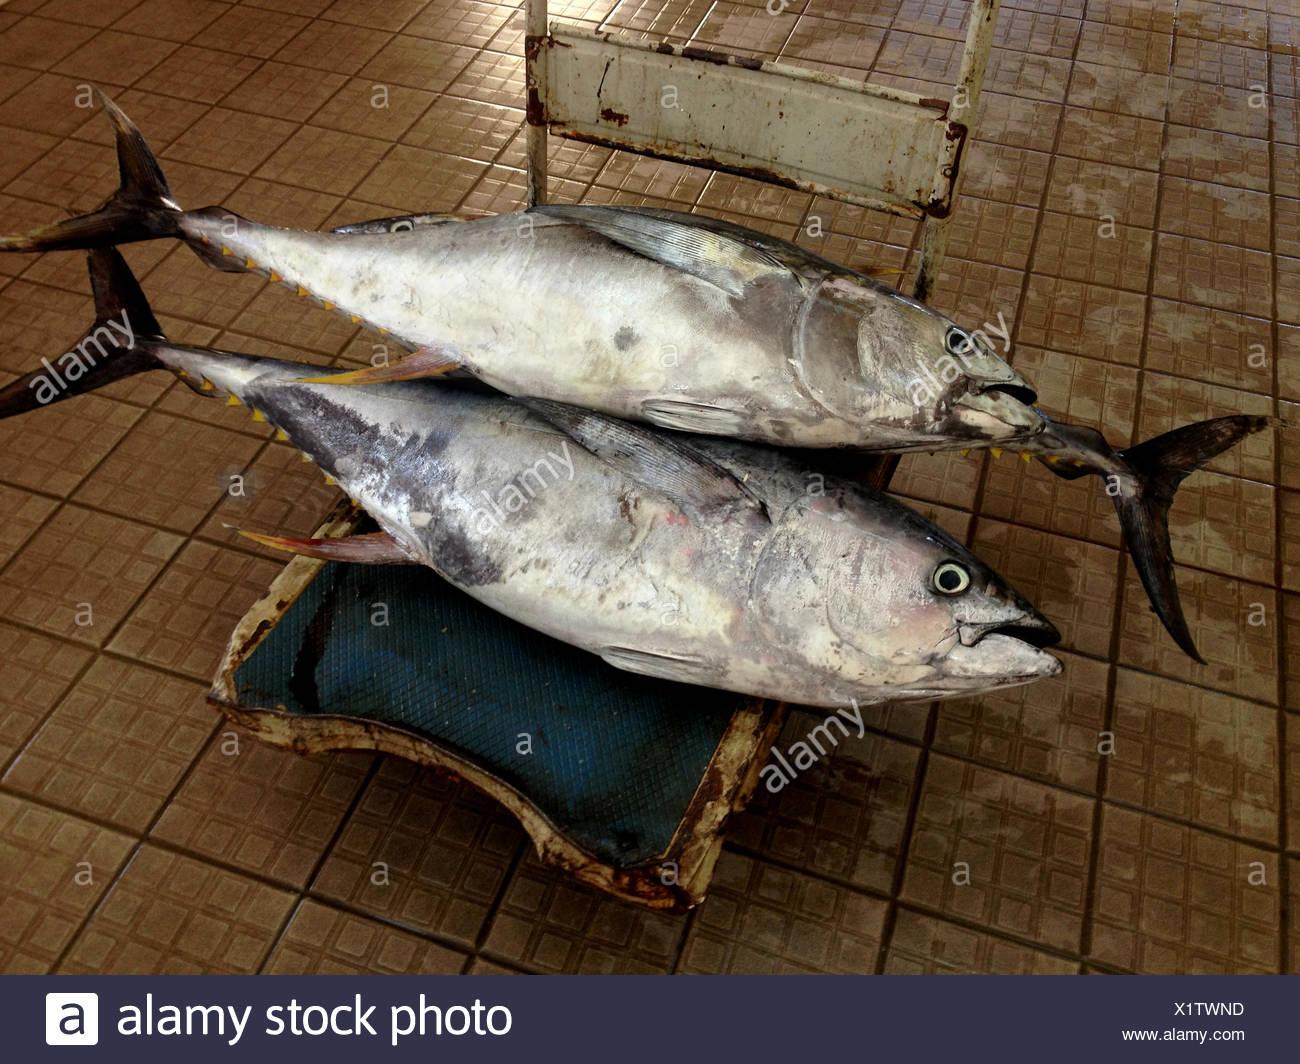 Yellowfin Tuna At Market Stock Photos & Yellowfin Tuna At Market